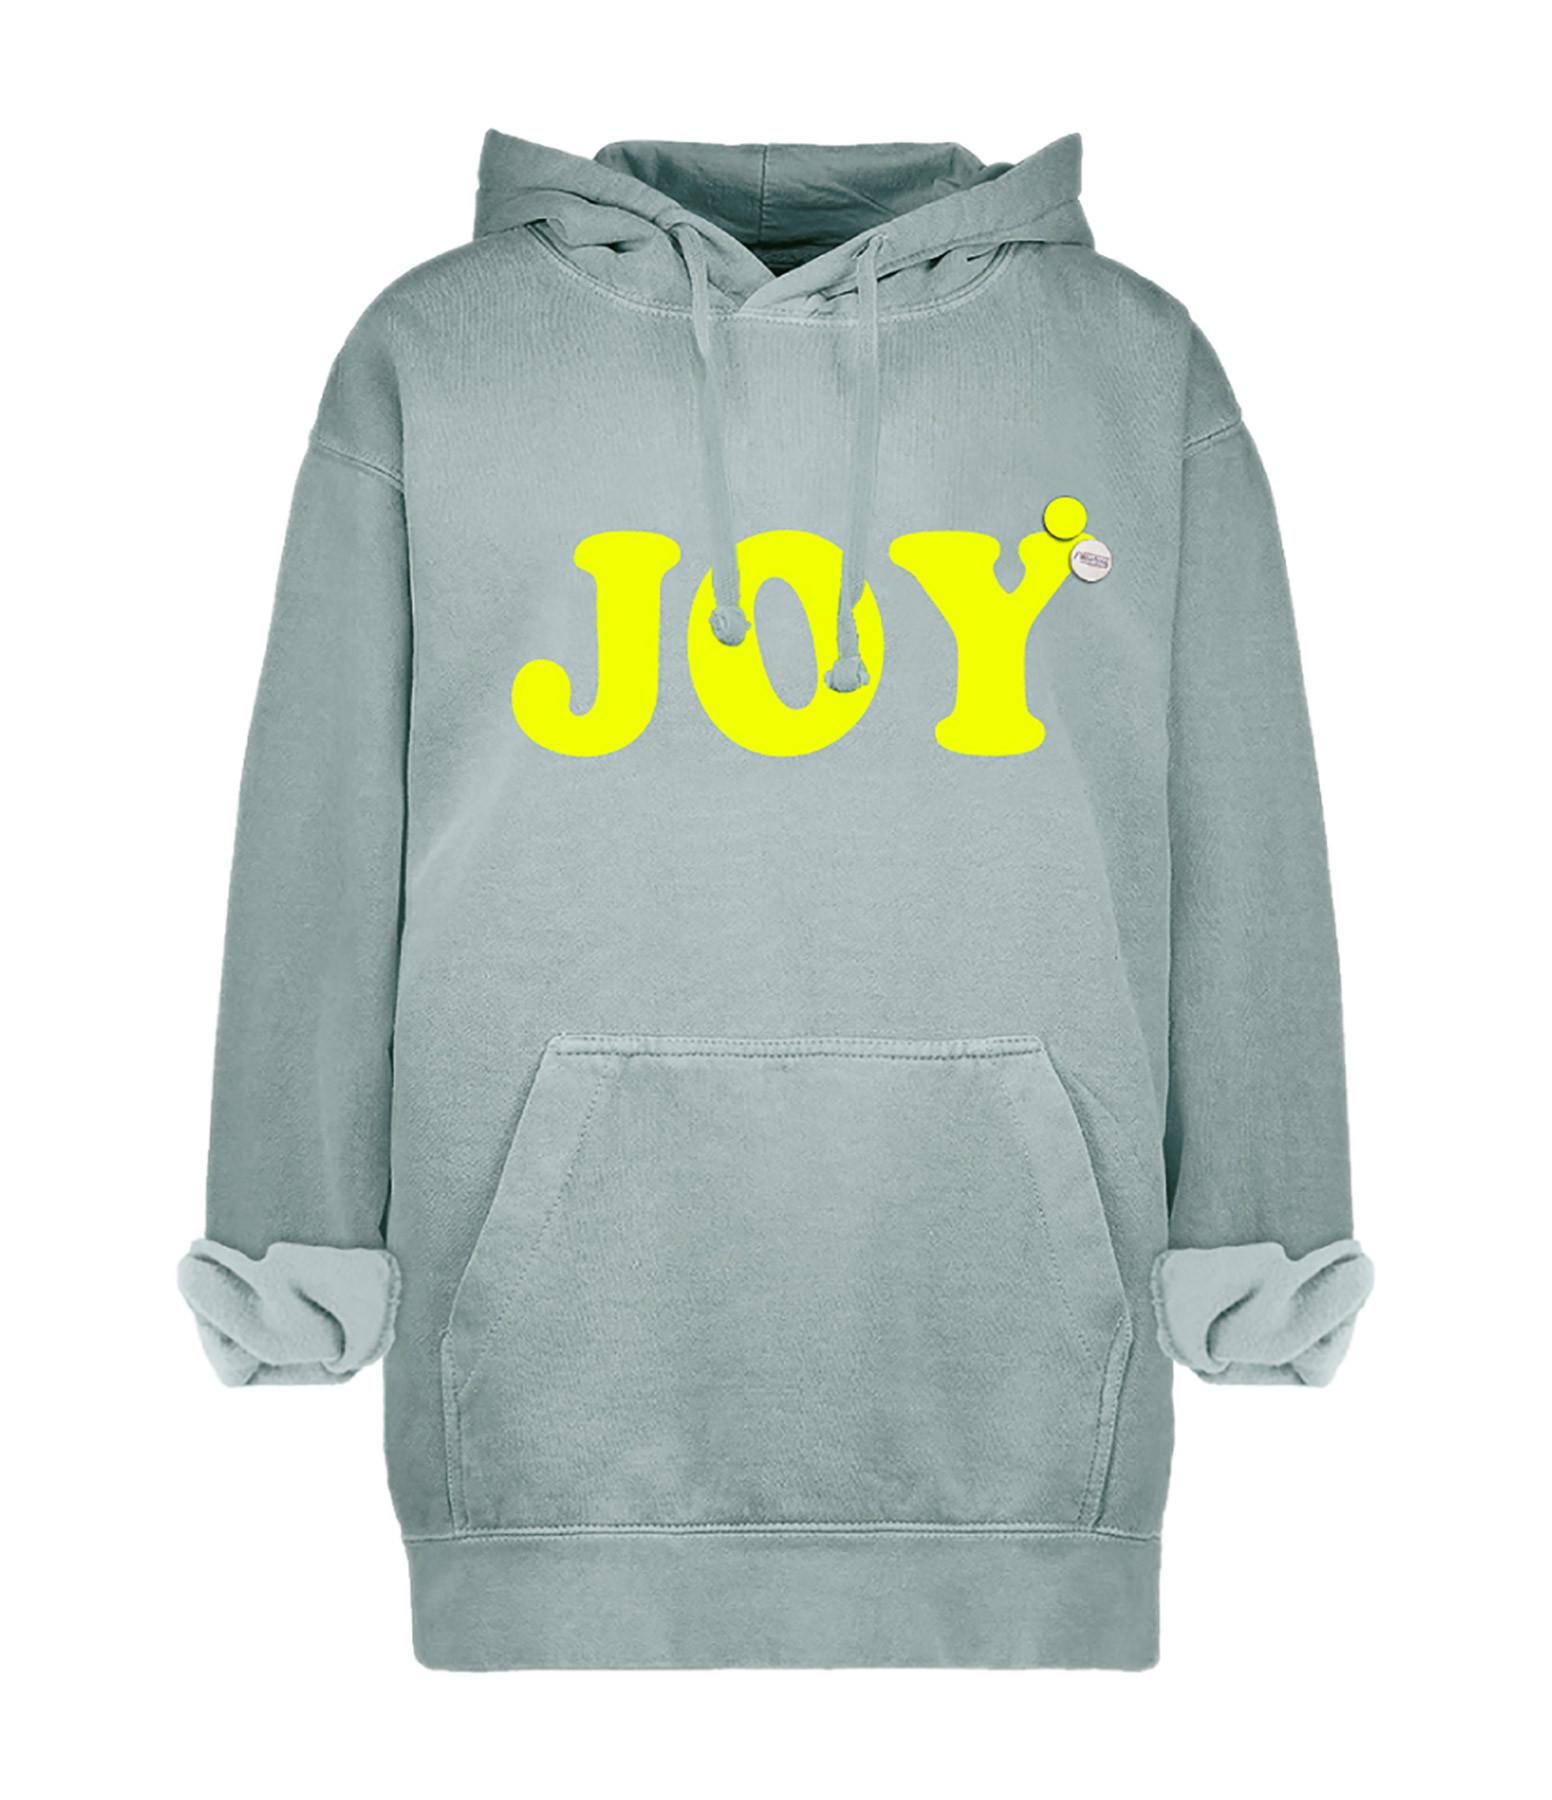 NEWTONE - Sweatshirt Hoodie Joy Coton Gris